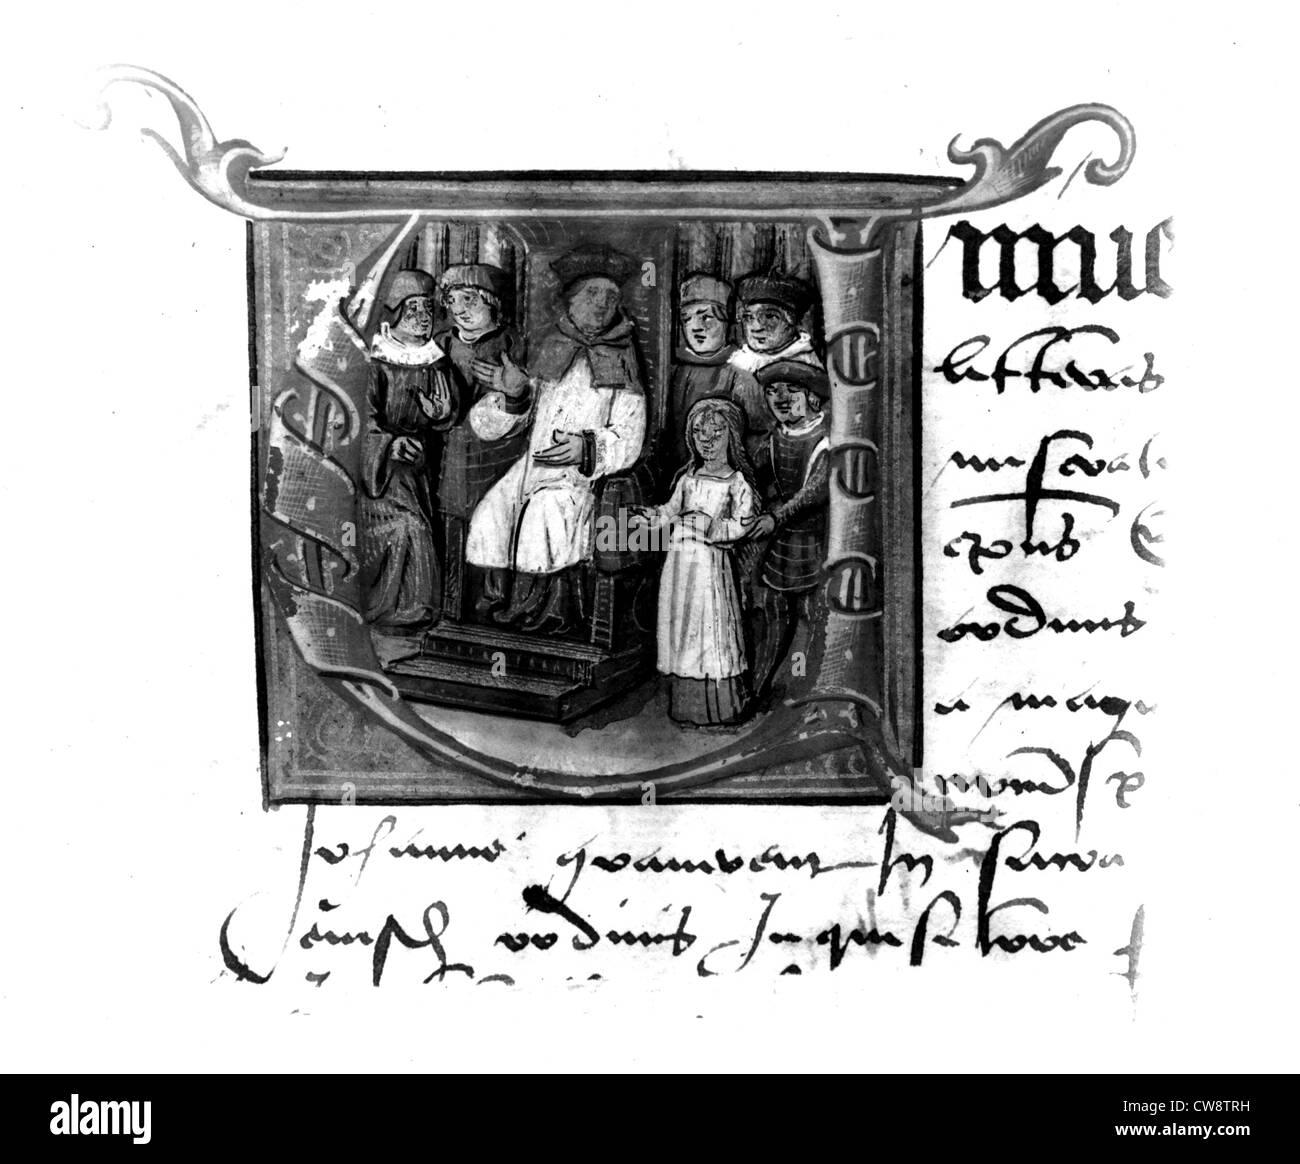 Anonyme lateinische Handschrift, Joan of Arc trial Stockbild